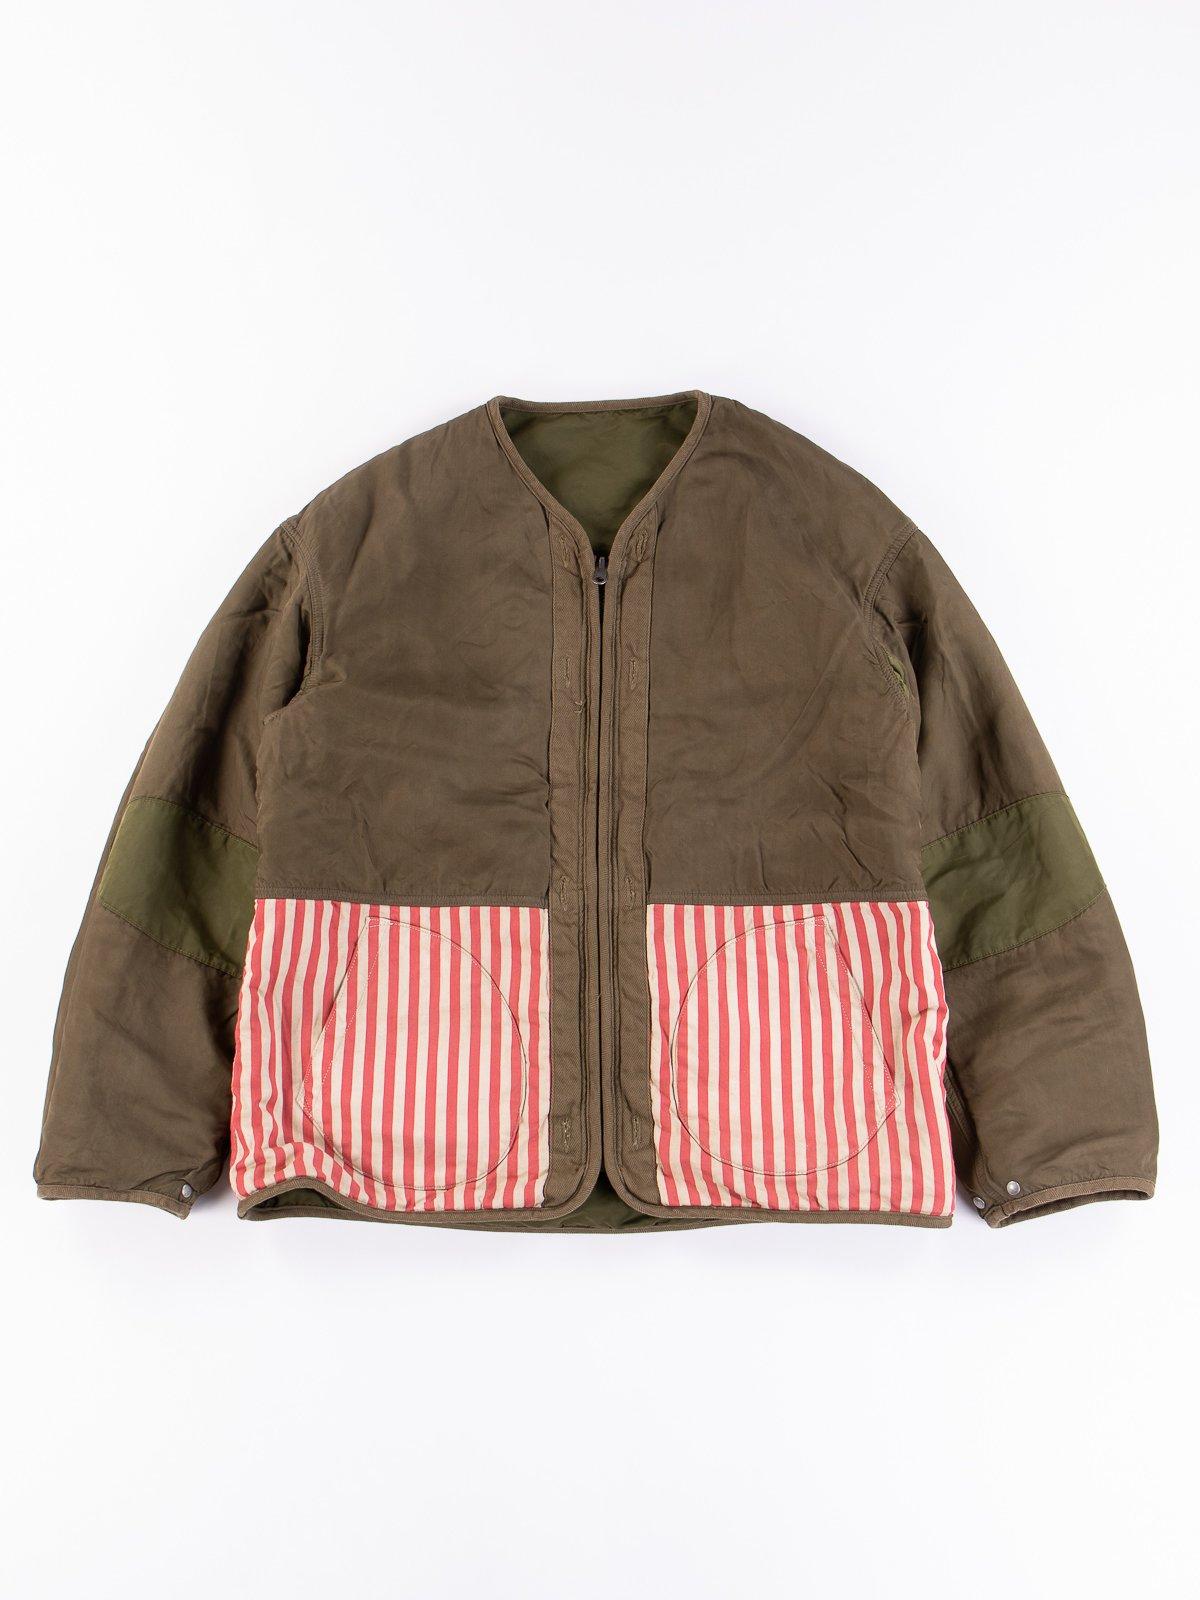 Olive Iris Liner Jacket - Image 6